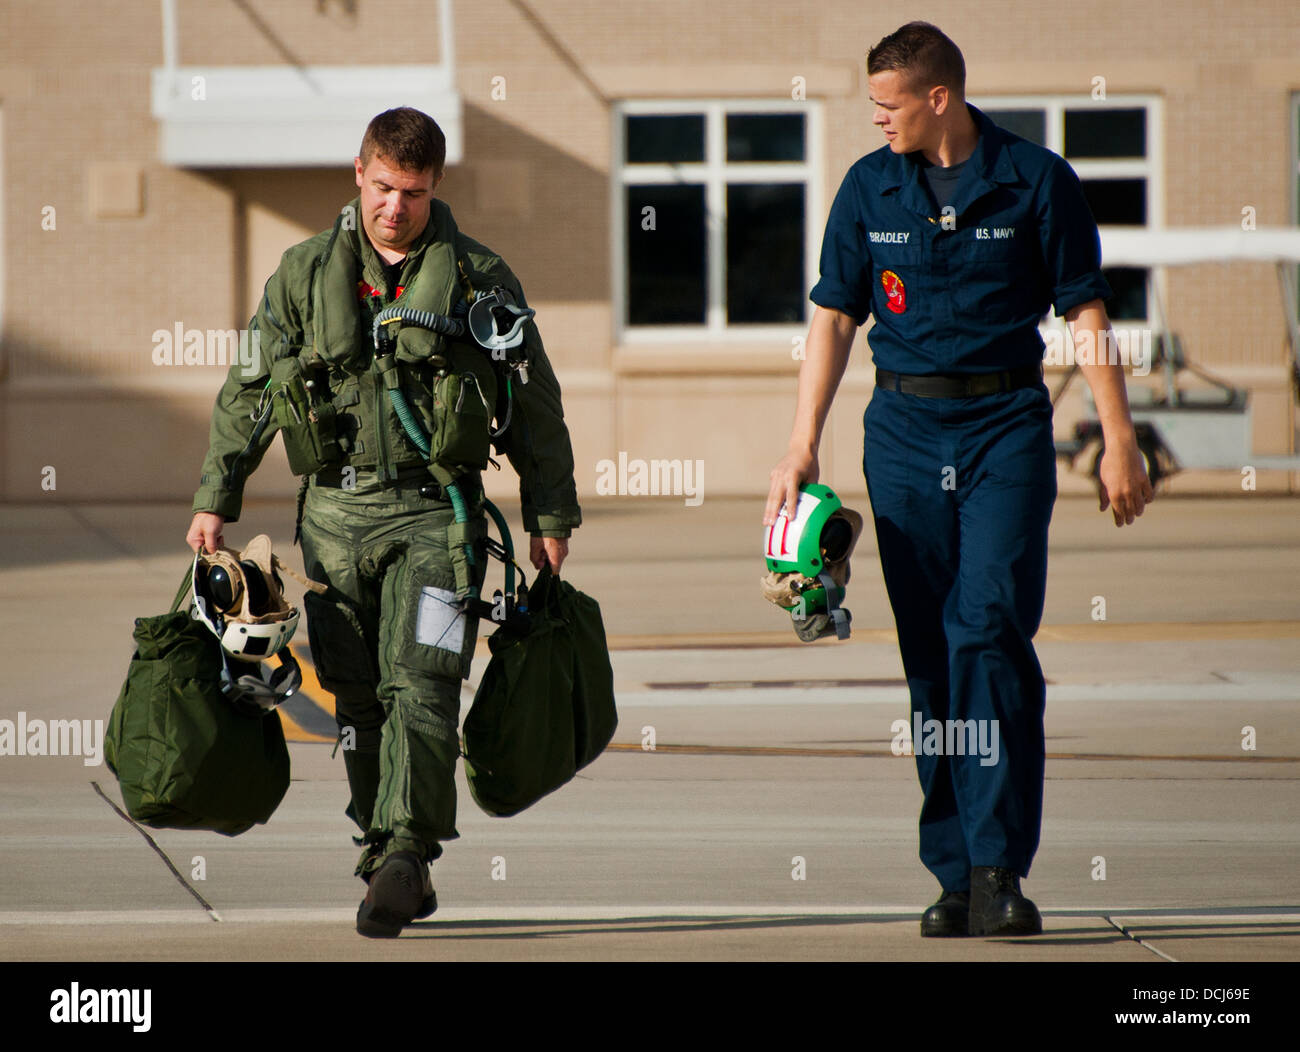 Lt. Cdr. Chris Tabert walks to the flightline to pilot the first F-35C Lightning II flight at Eglin Air Force Base - Stock Image